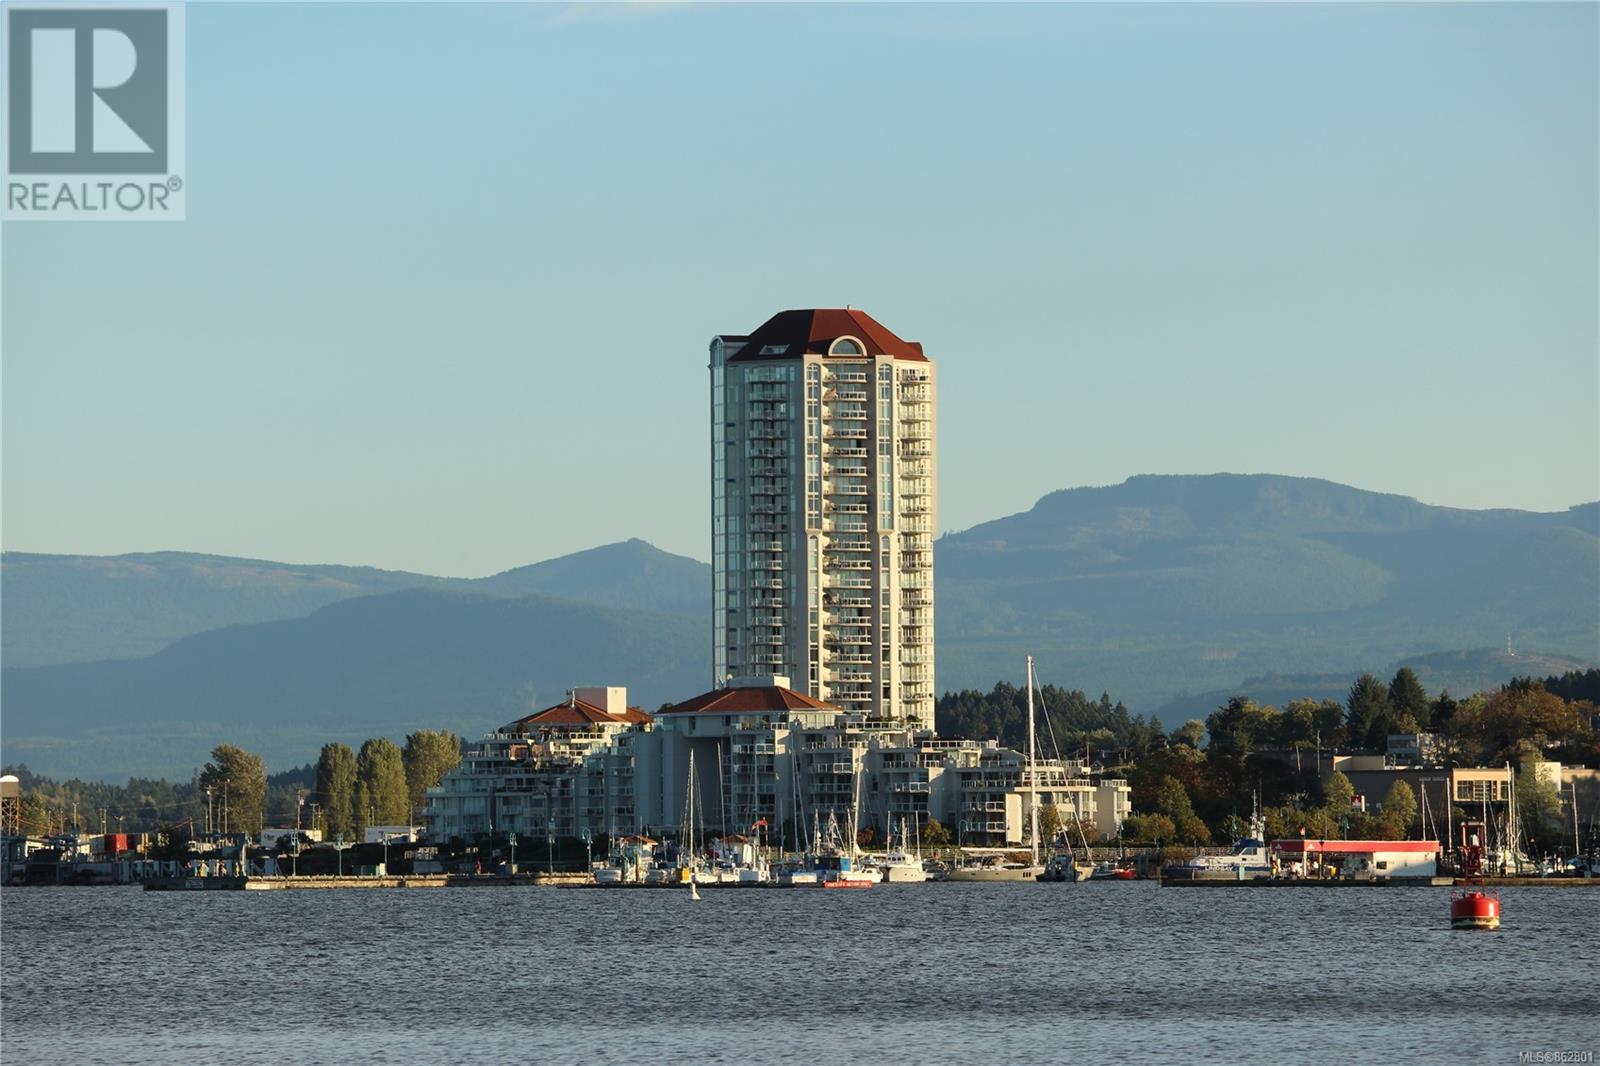 203 150 Promenade Dr, Nanaimo, British Columbia  V9R 6M6 - Photo 19 - 862801